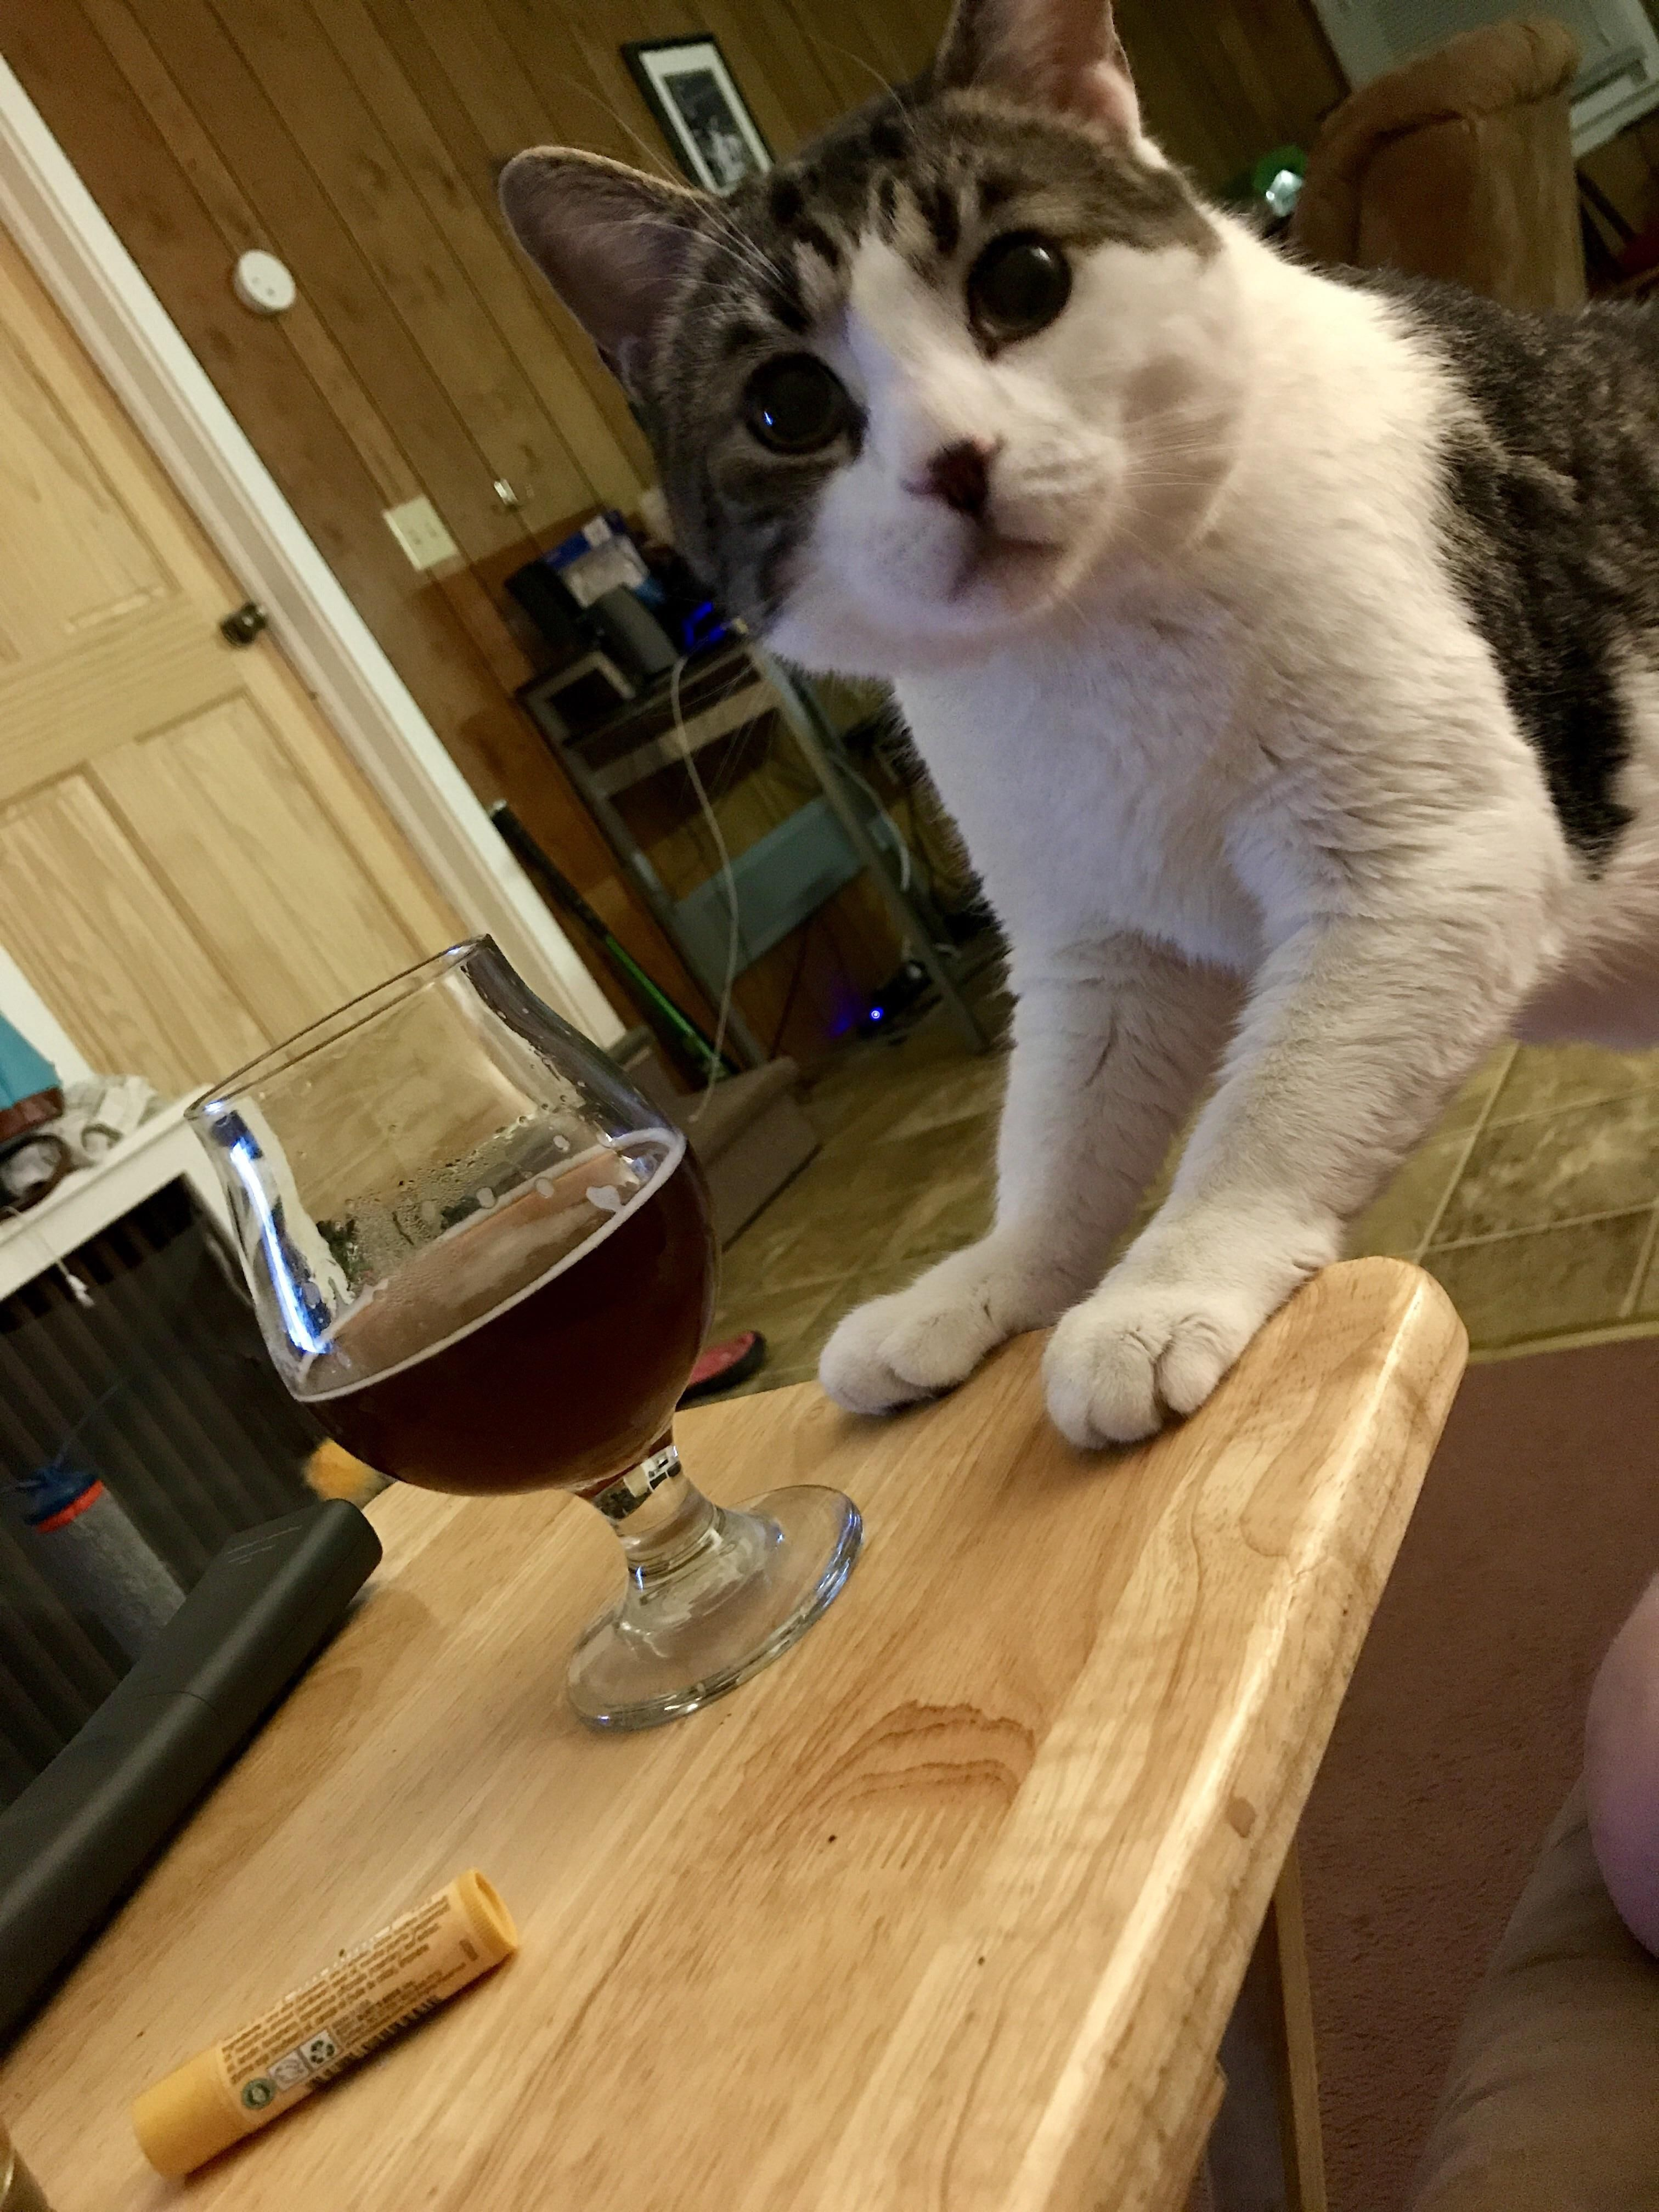 Is this catnip flavored? http://ift.tt/2ulqX95